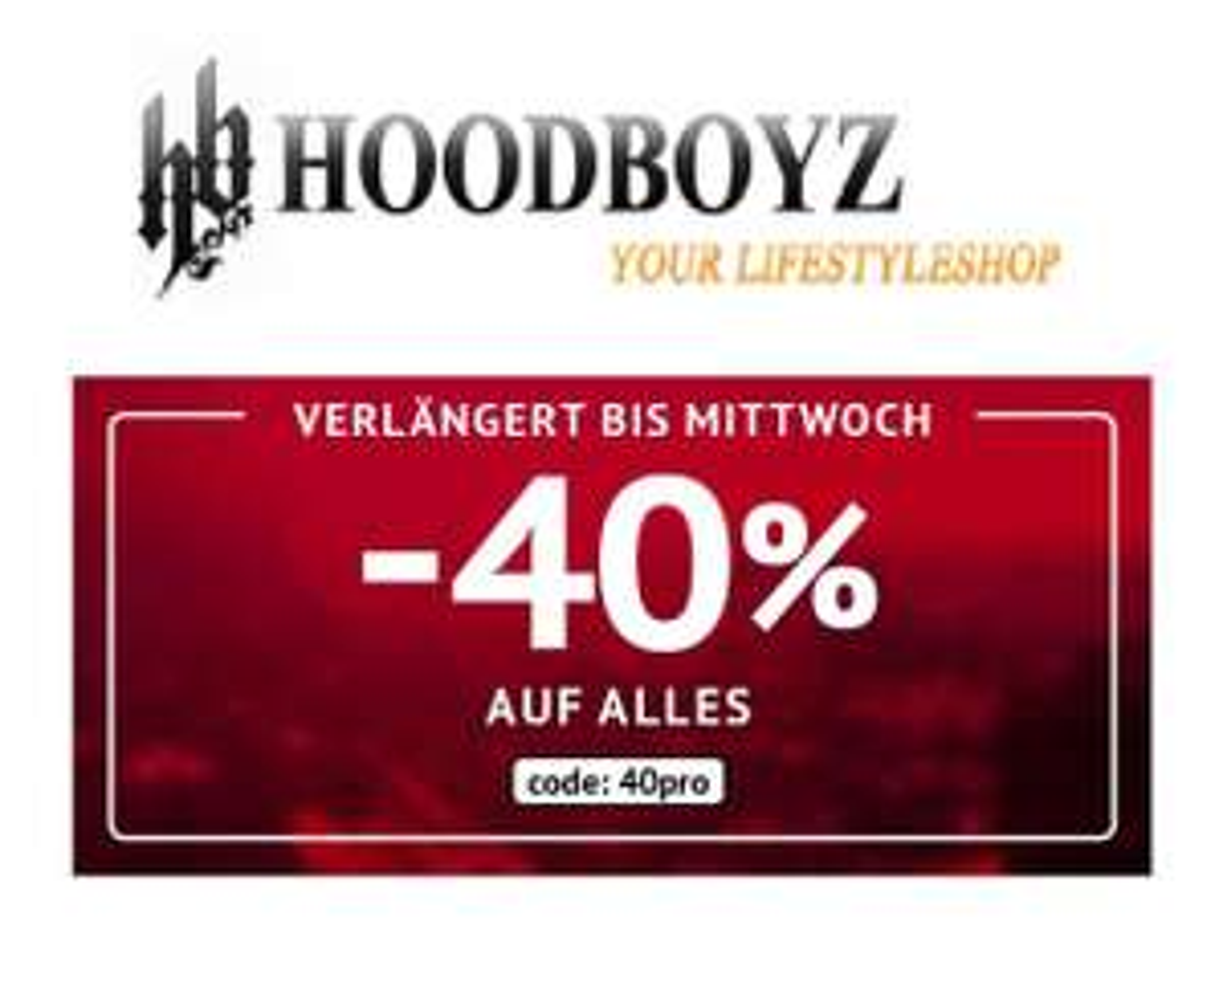 Hoodboyz: 40% Rabatt auf Alles!*